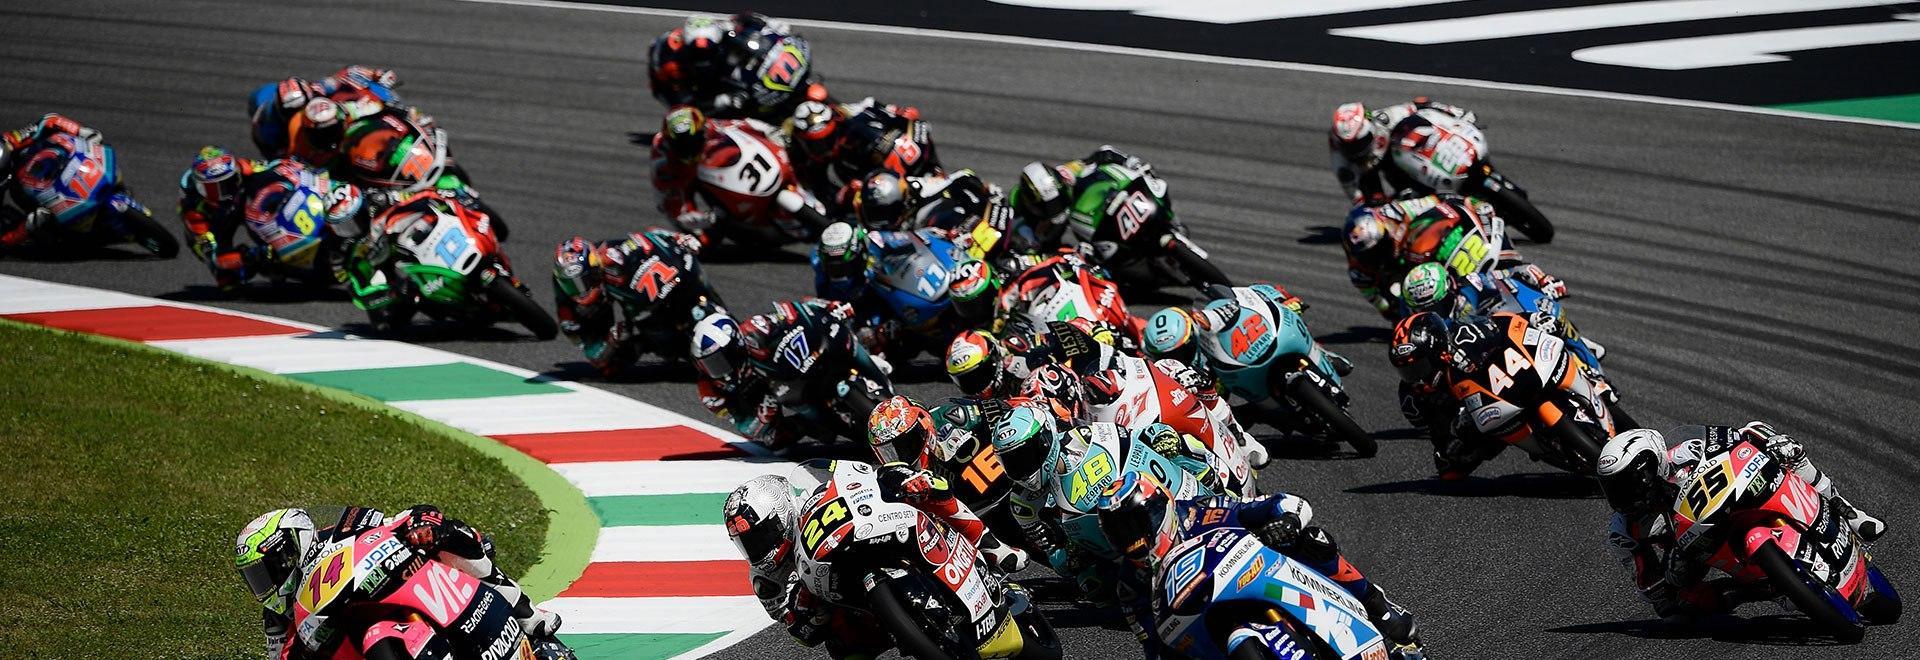 PreMoto3 Vallelunga. Race 2